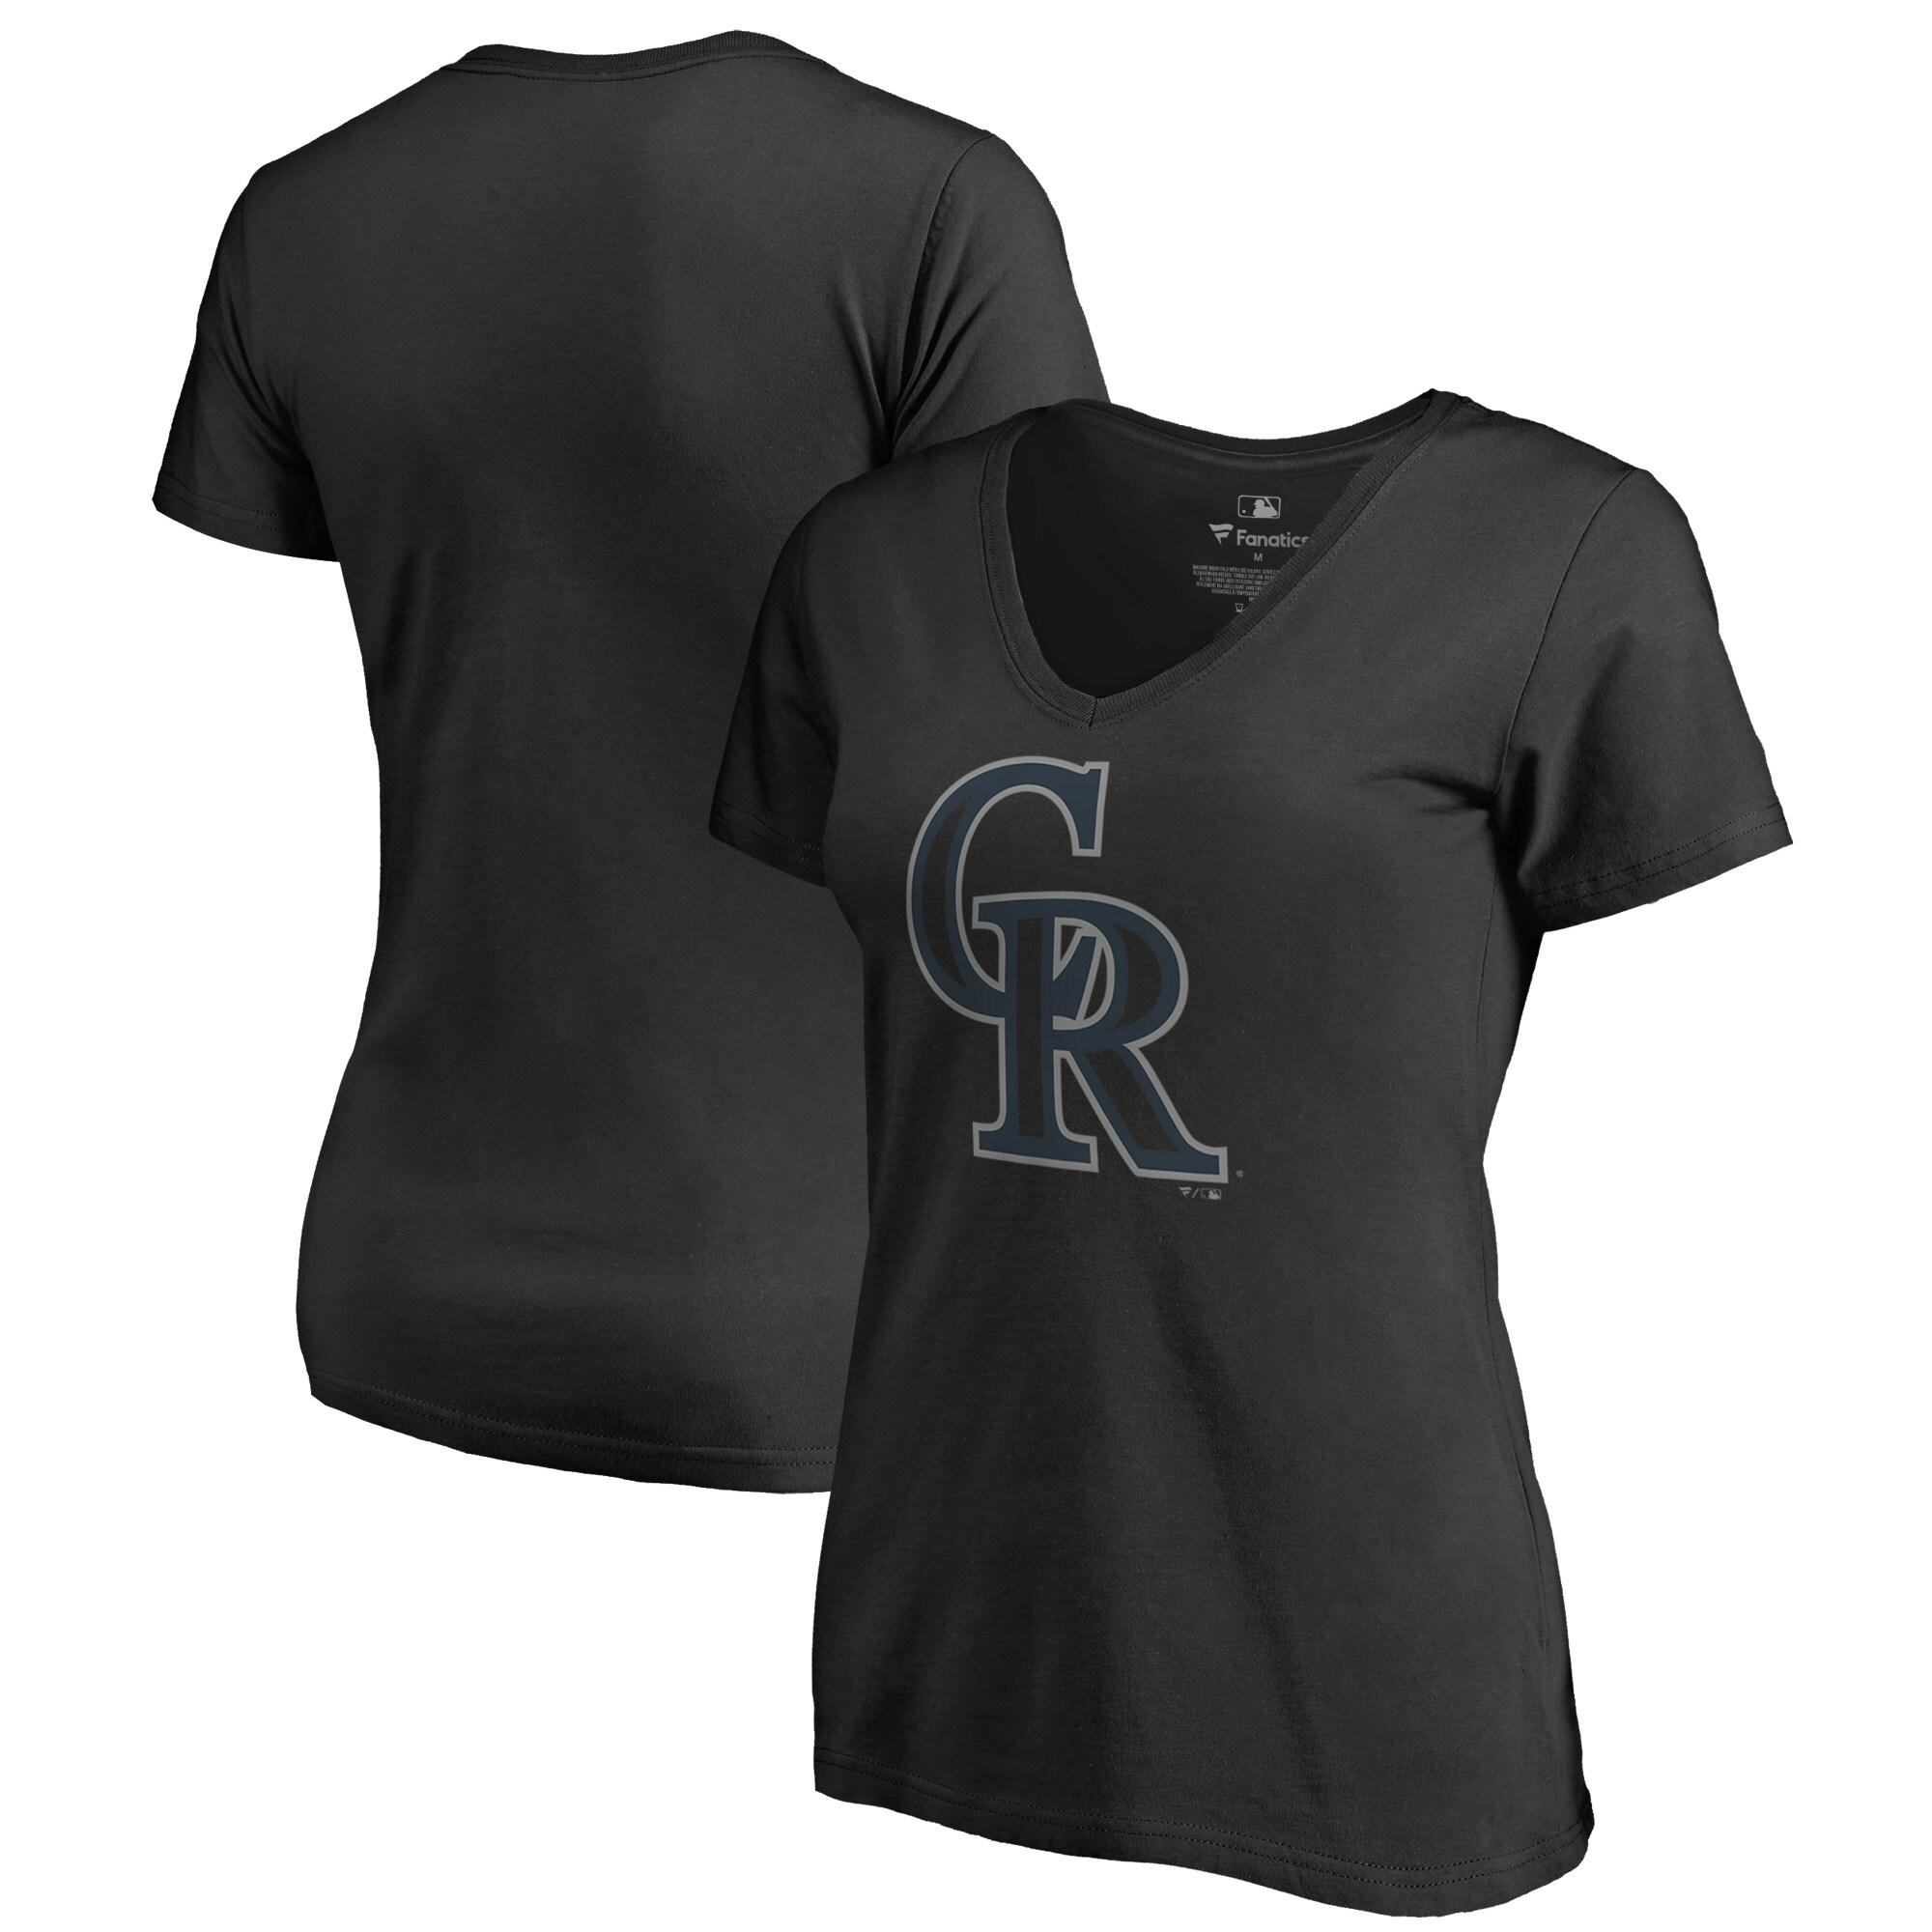 Colorado Rockies Fanatics Branded Women's Taylor Plus Size V-Neck T-Shirt - Black